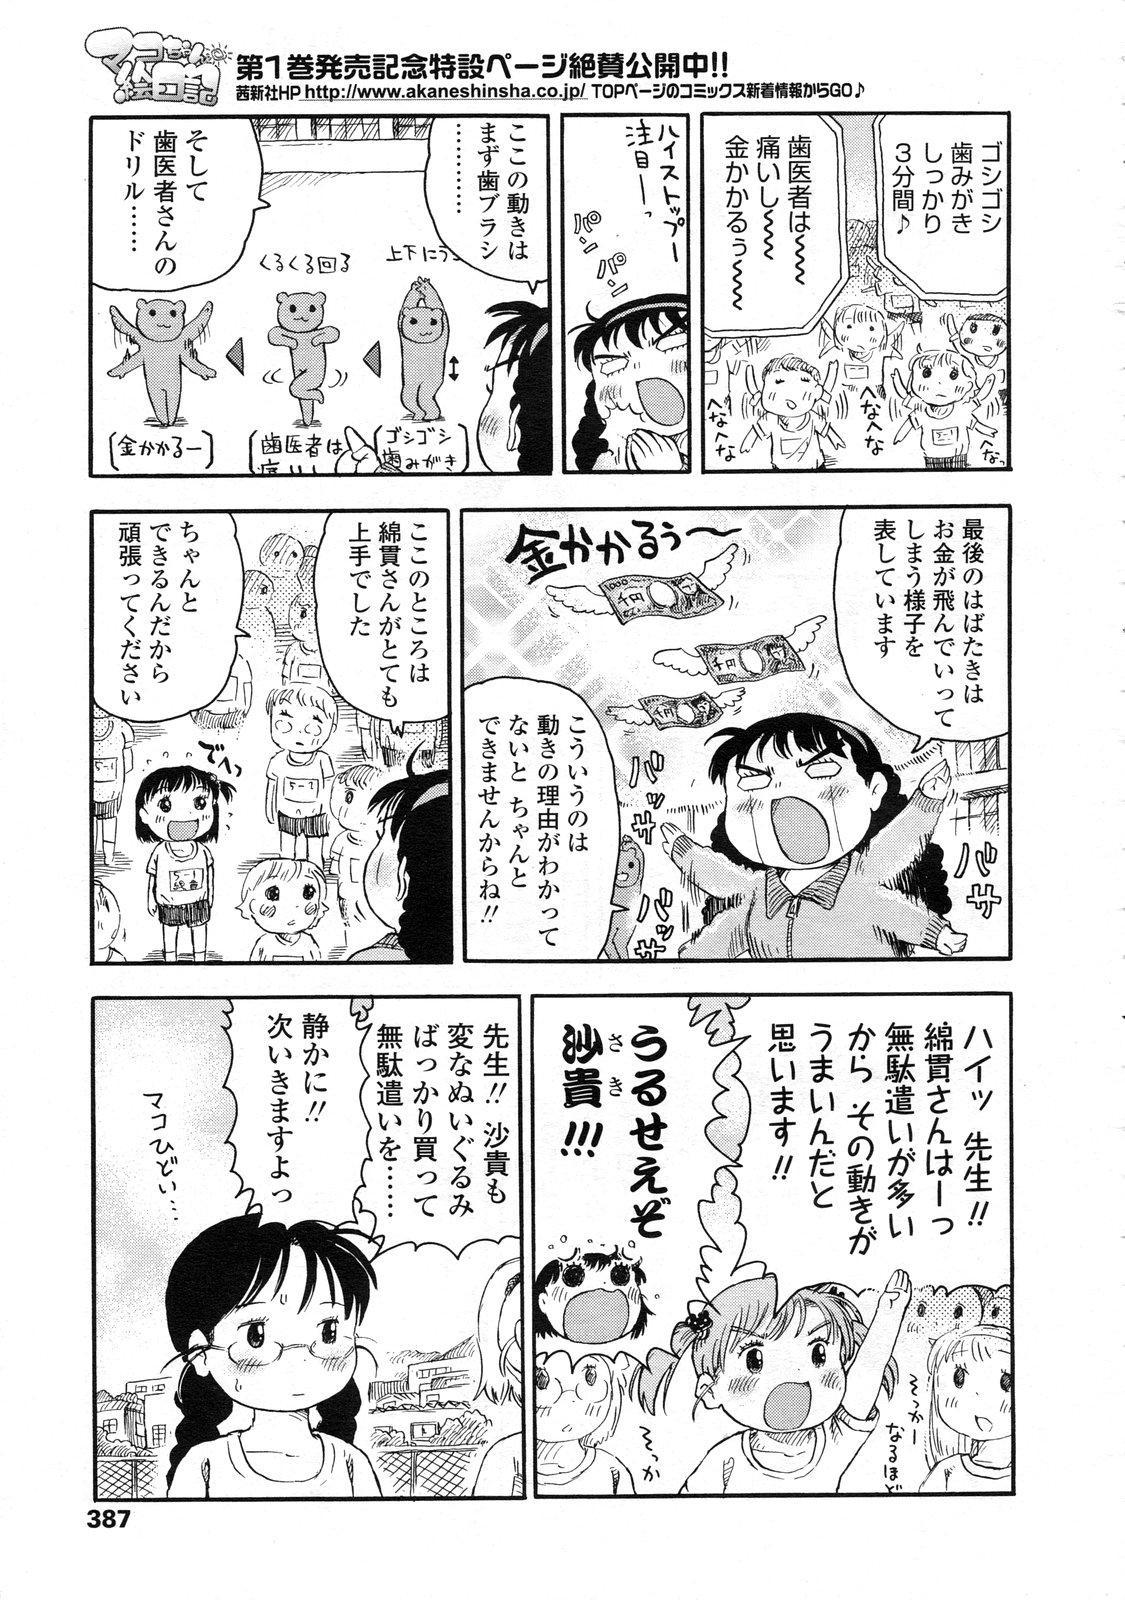 COMIC LO 2009-09 Vol. 66 387